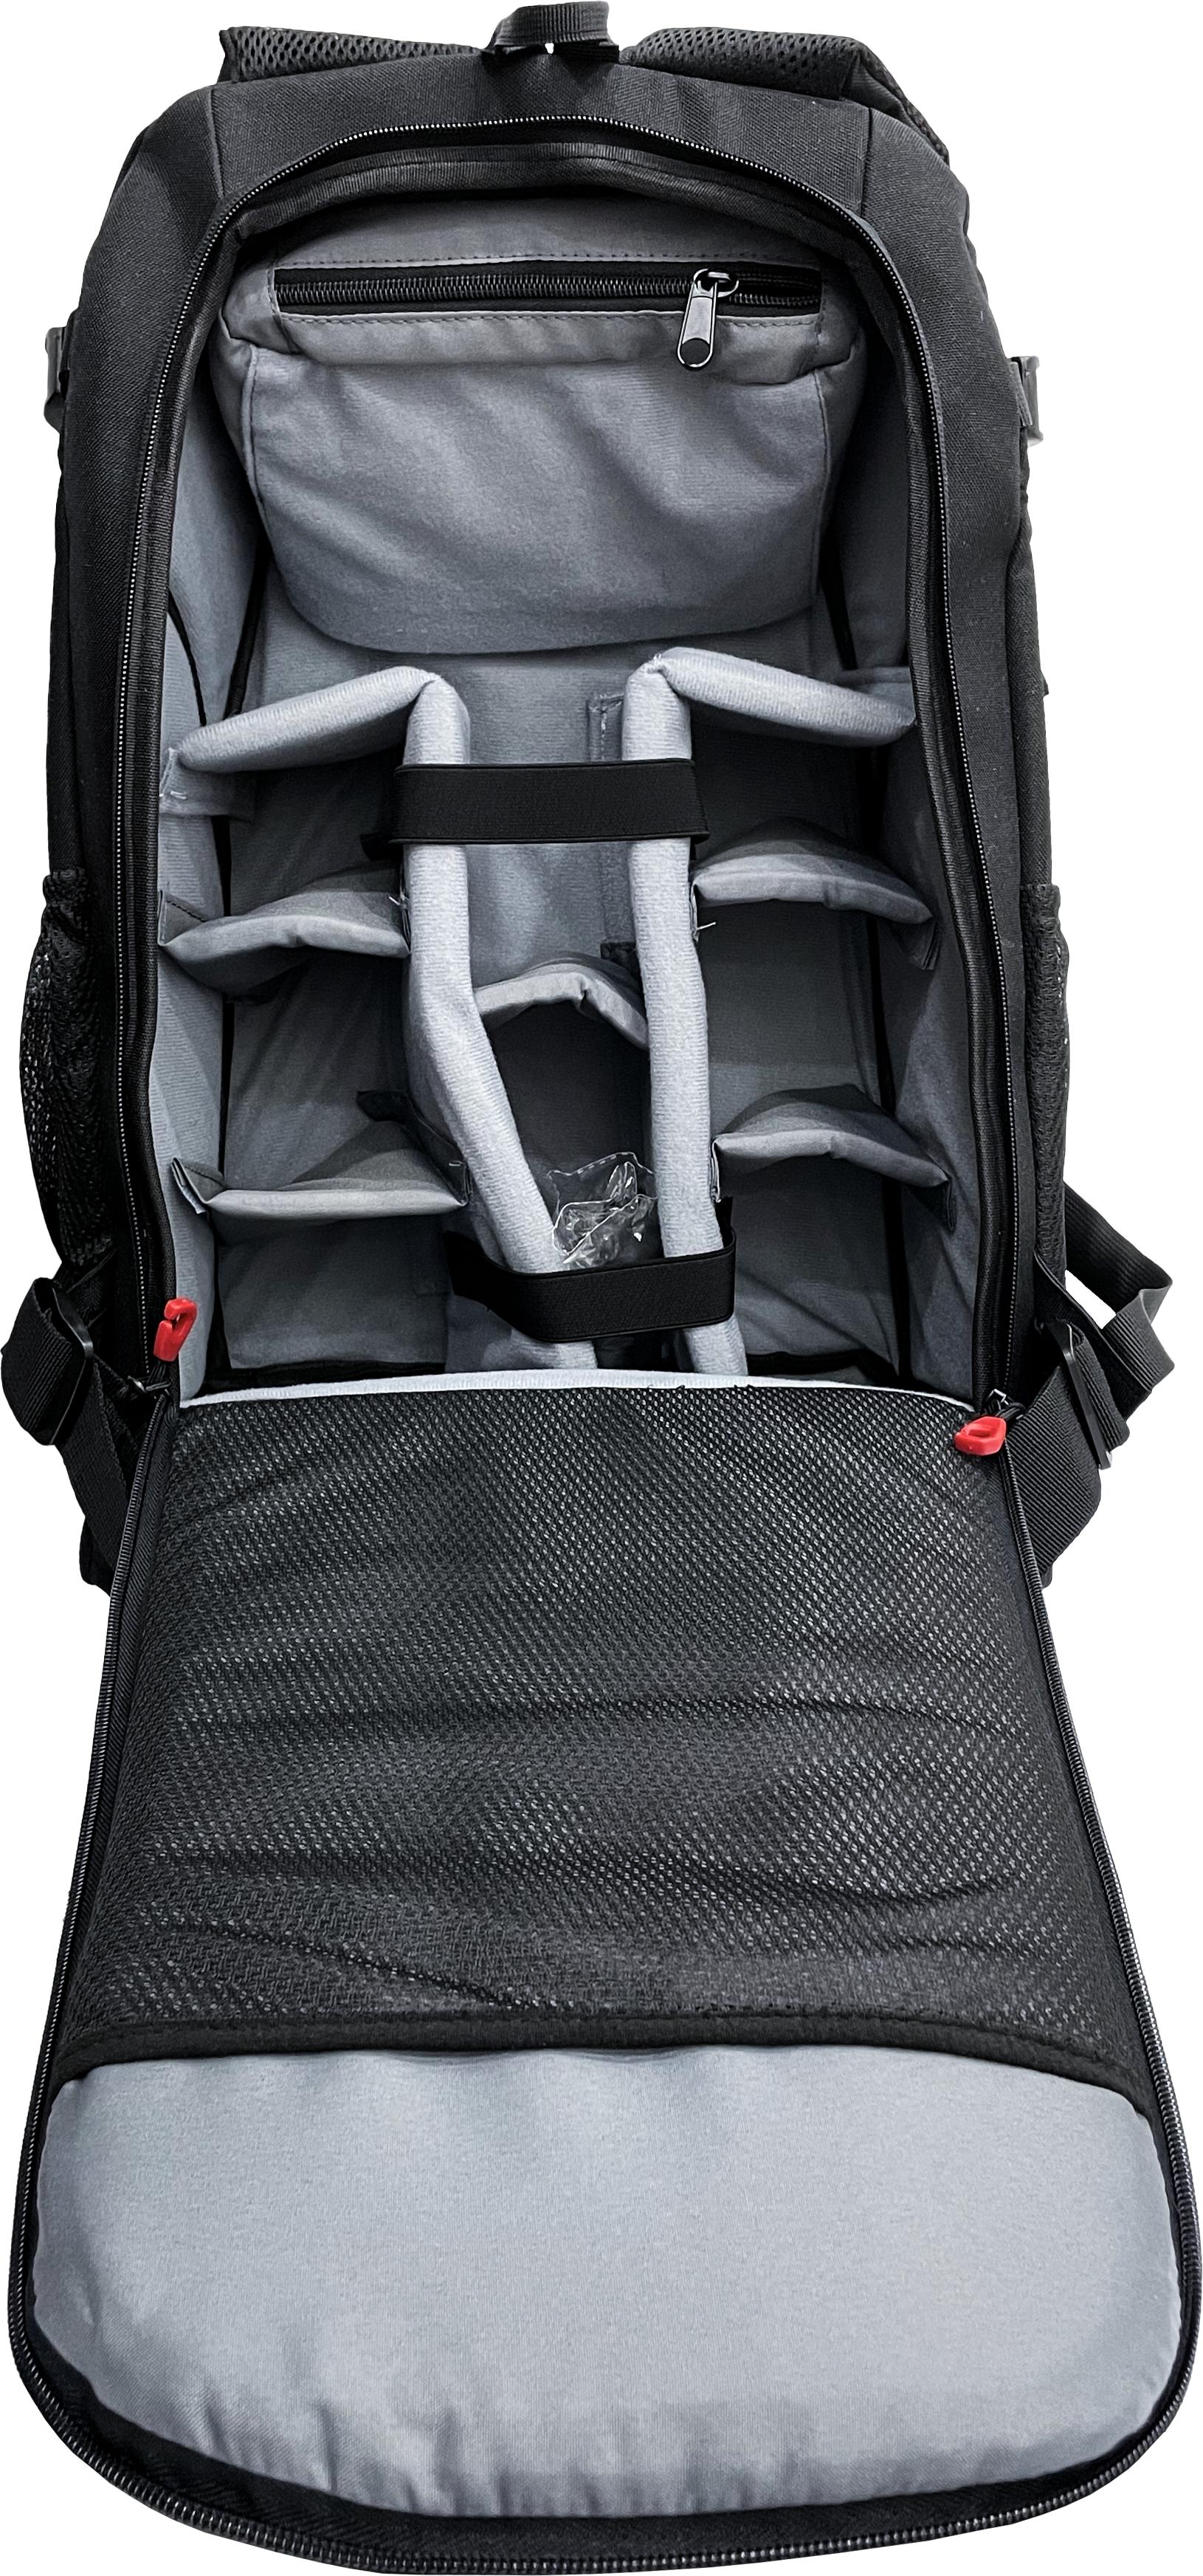 DSLR Backpack For Nikon